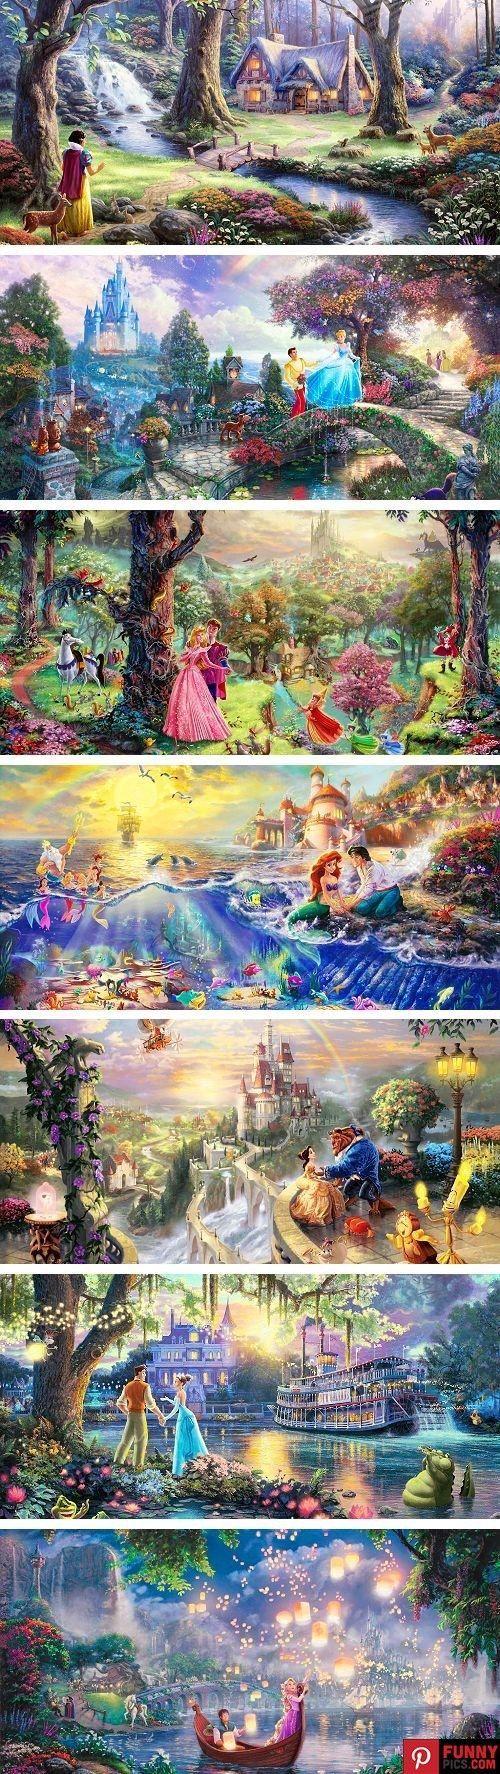 Disney meets Thomas Kincade style